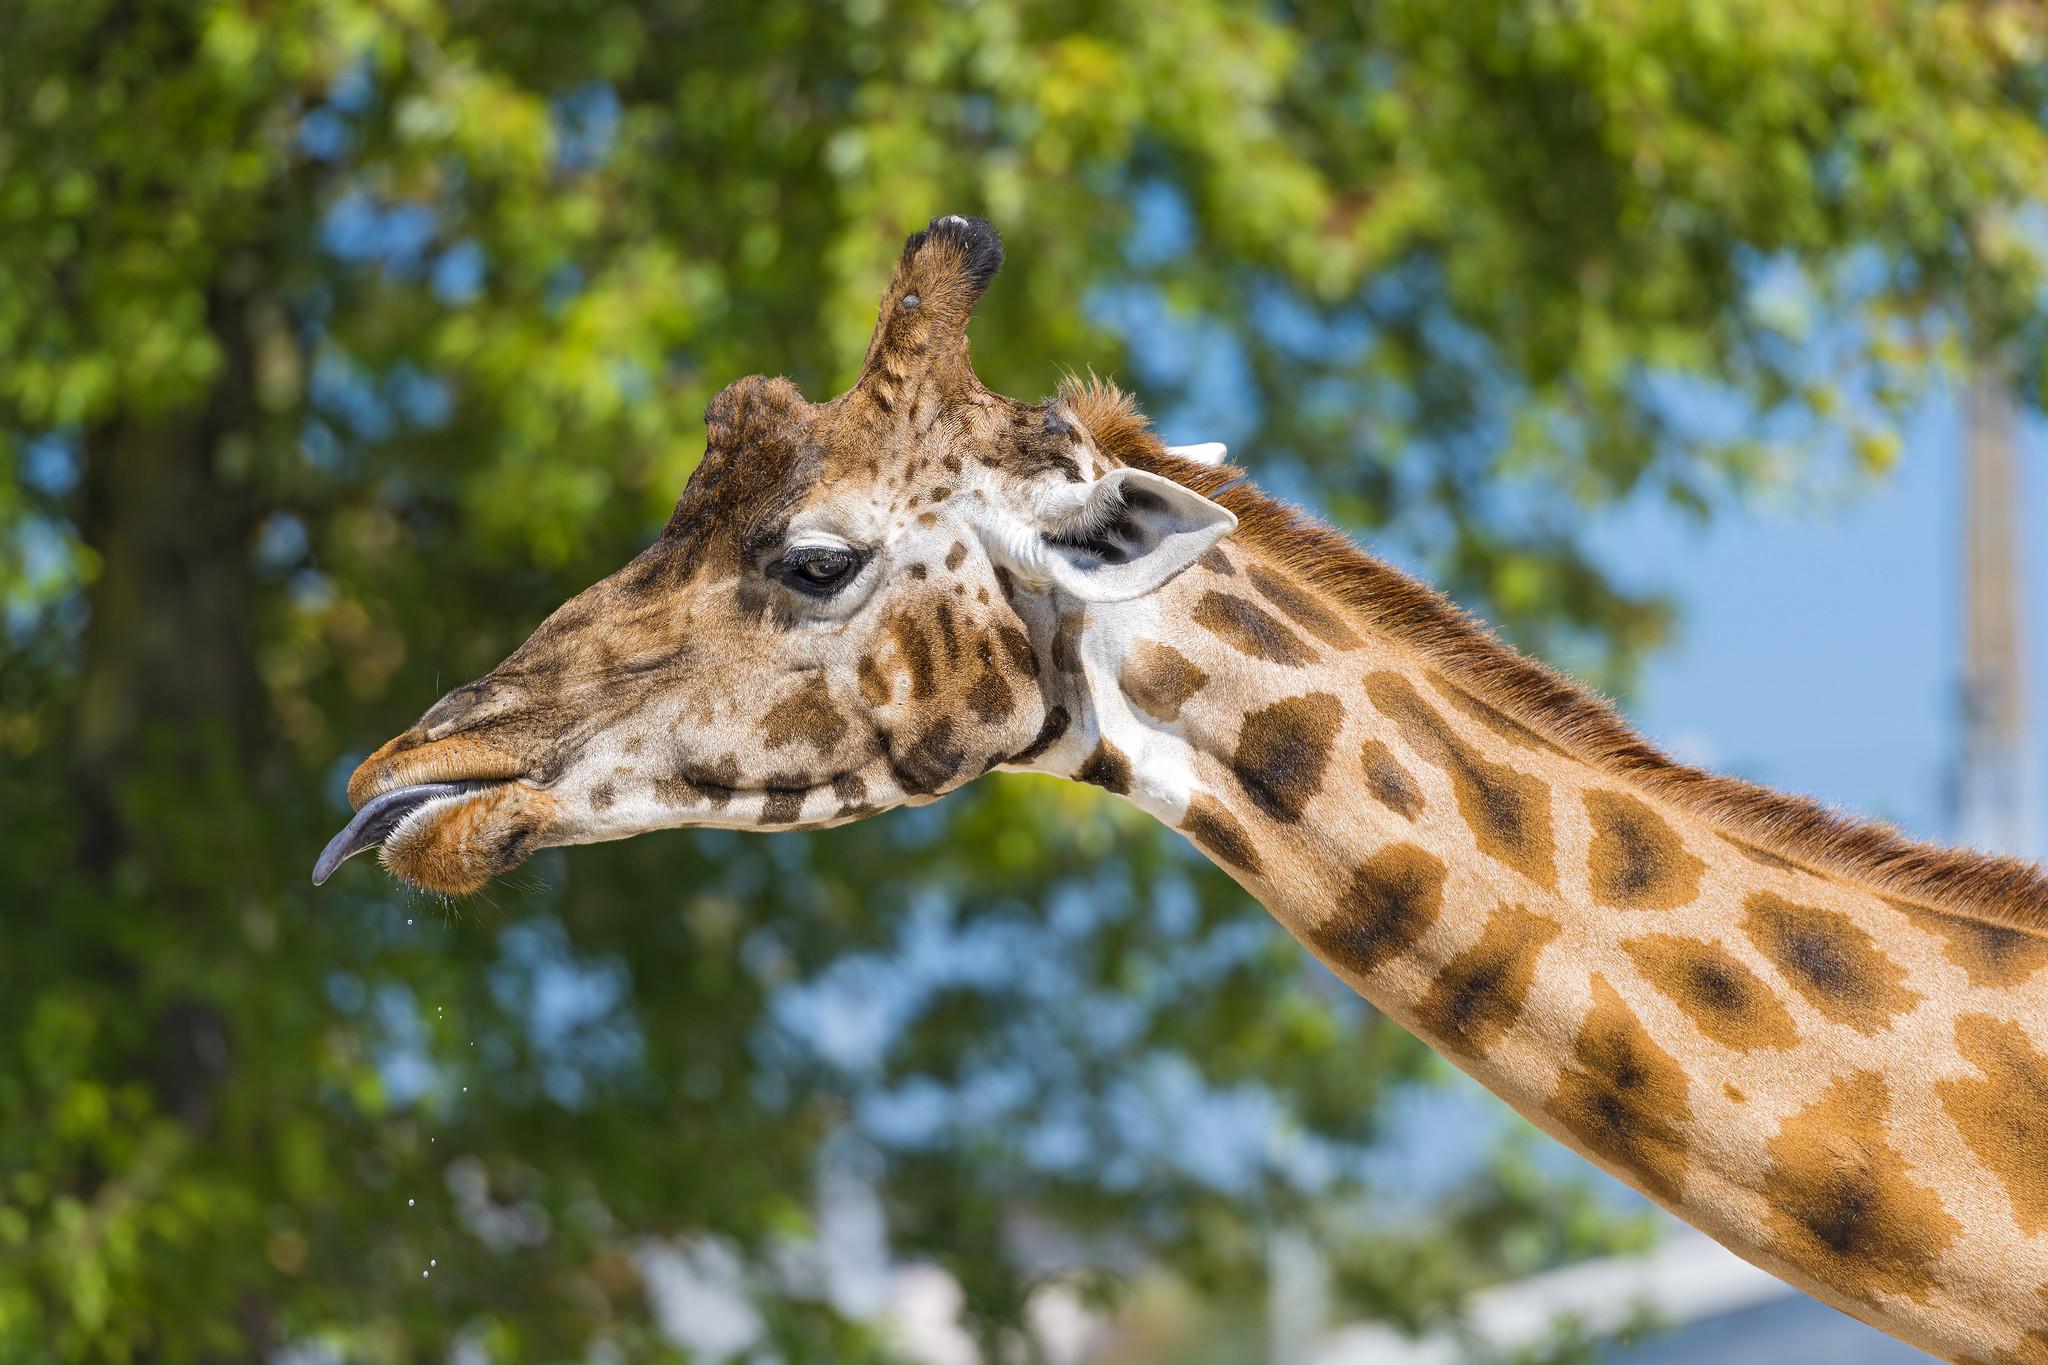 Giraffe head and neck | Flickr - Photo Sharing! - photo#16